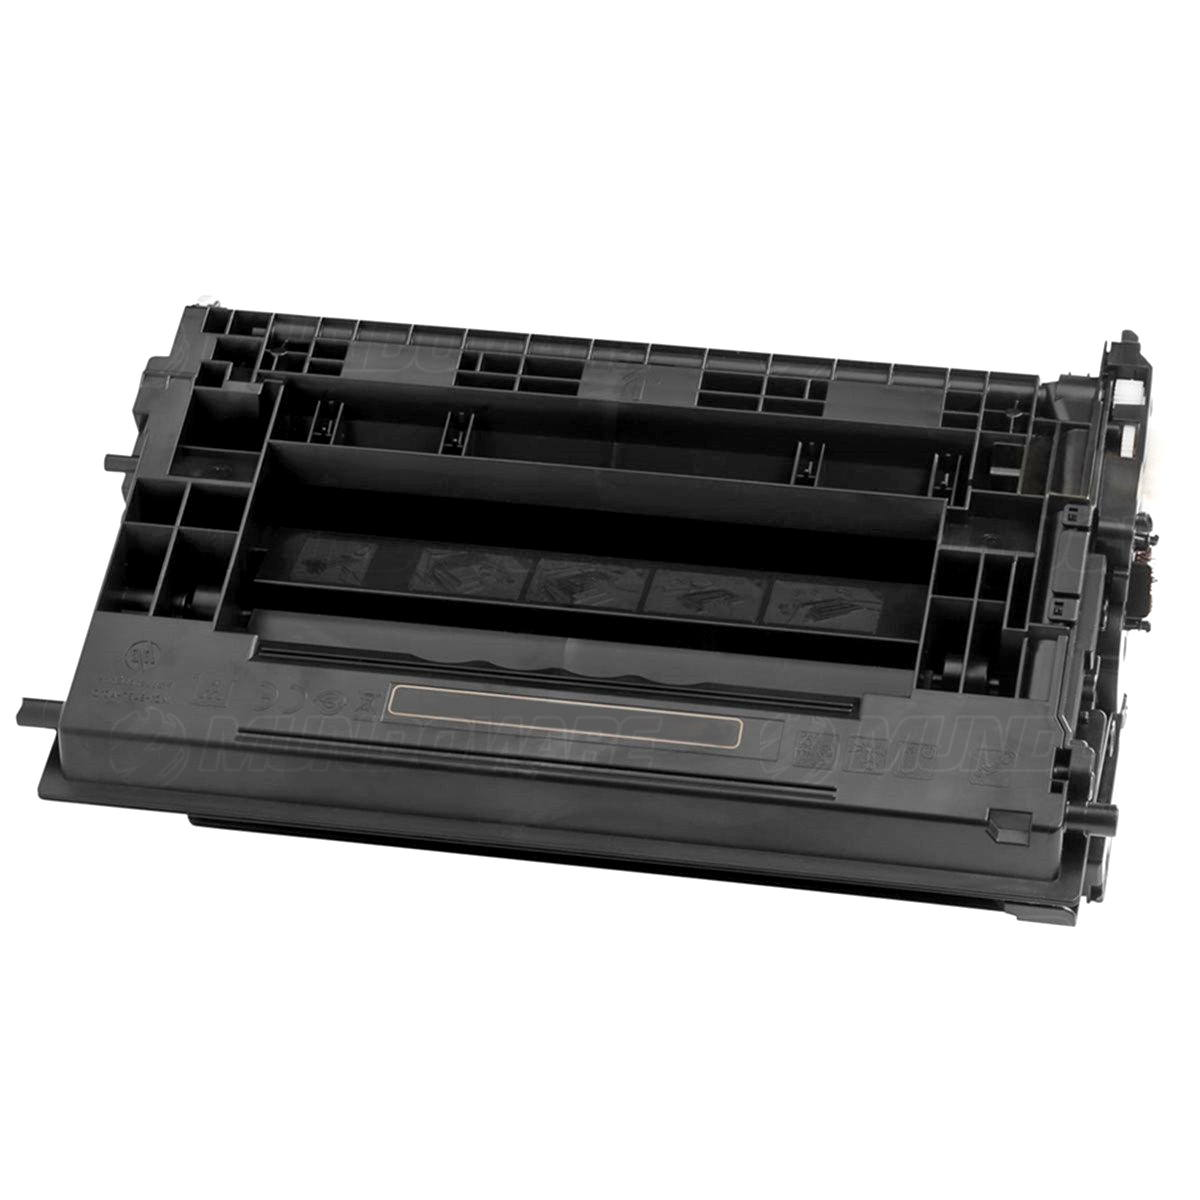 Compátivel: Toner CF237A 237A para Impressora HP M607 M608 M609 MFP M631 M632 M633 M607dn M608dn M609dn Preto 11.000